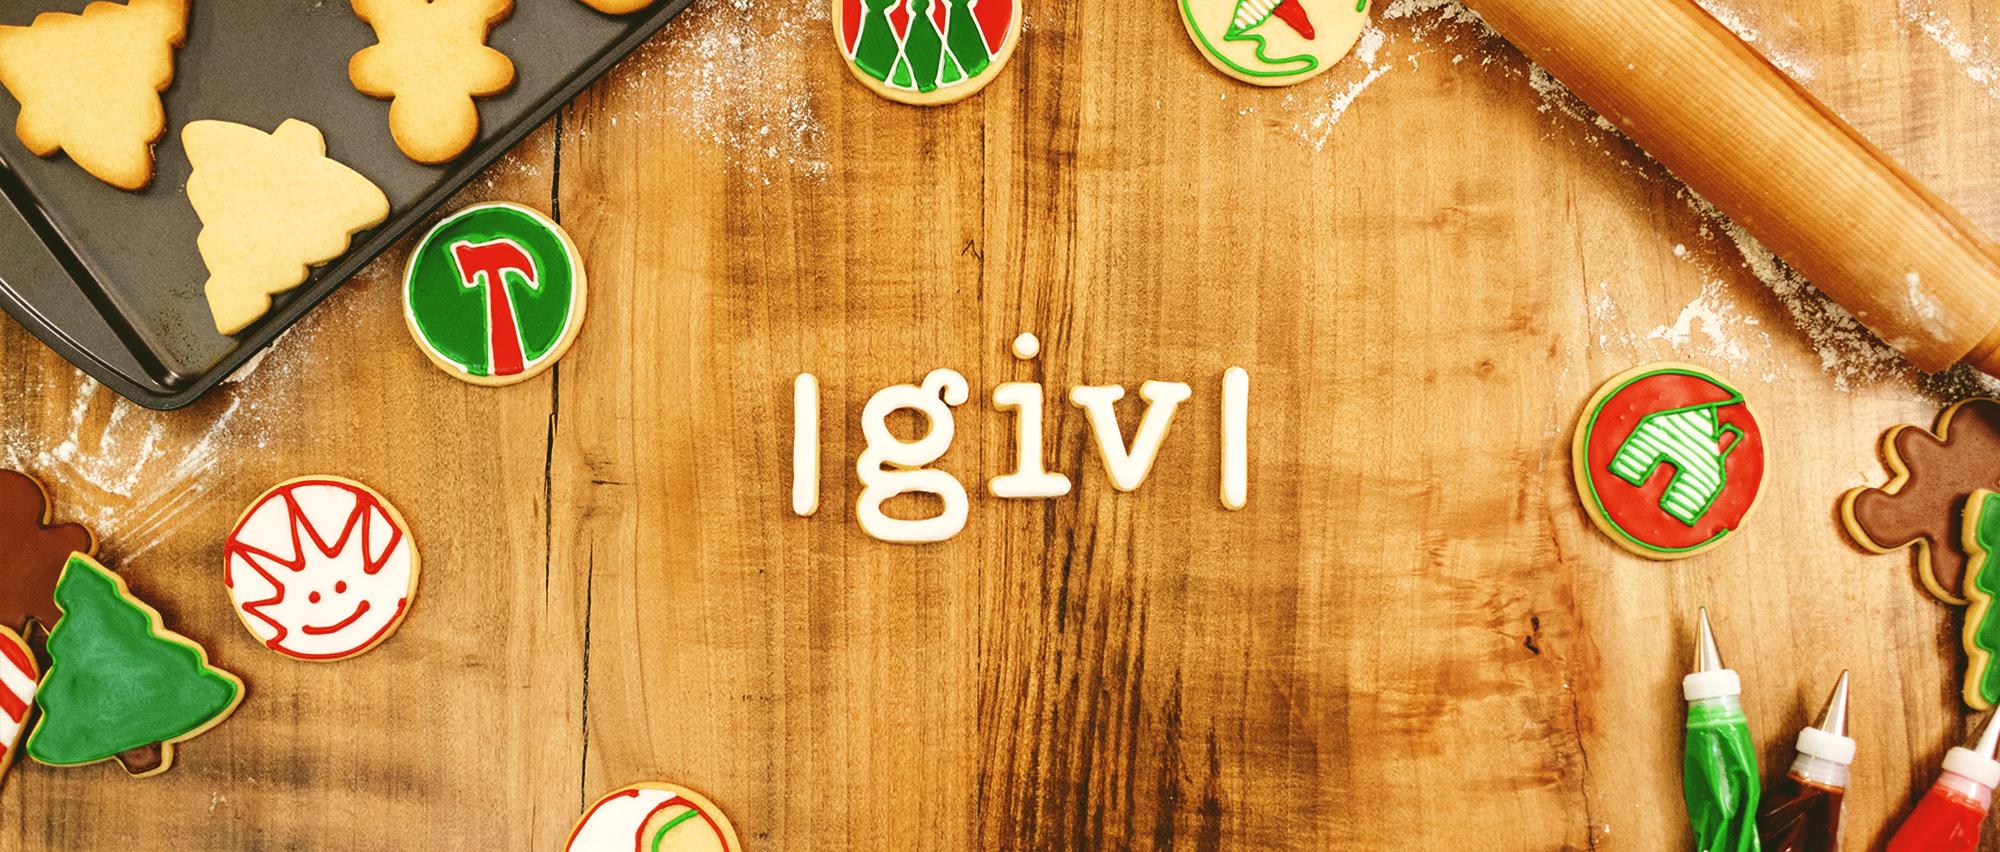 GIV_Web.jpg